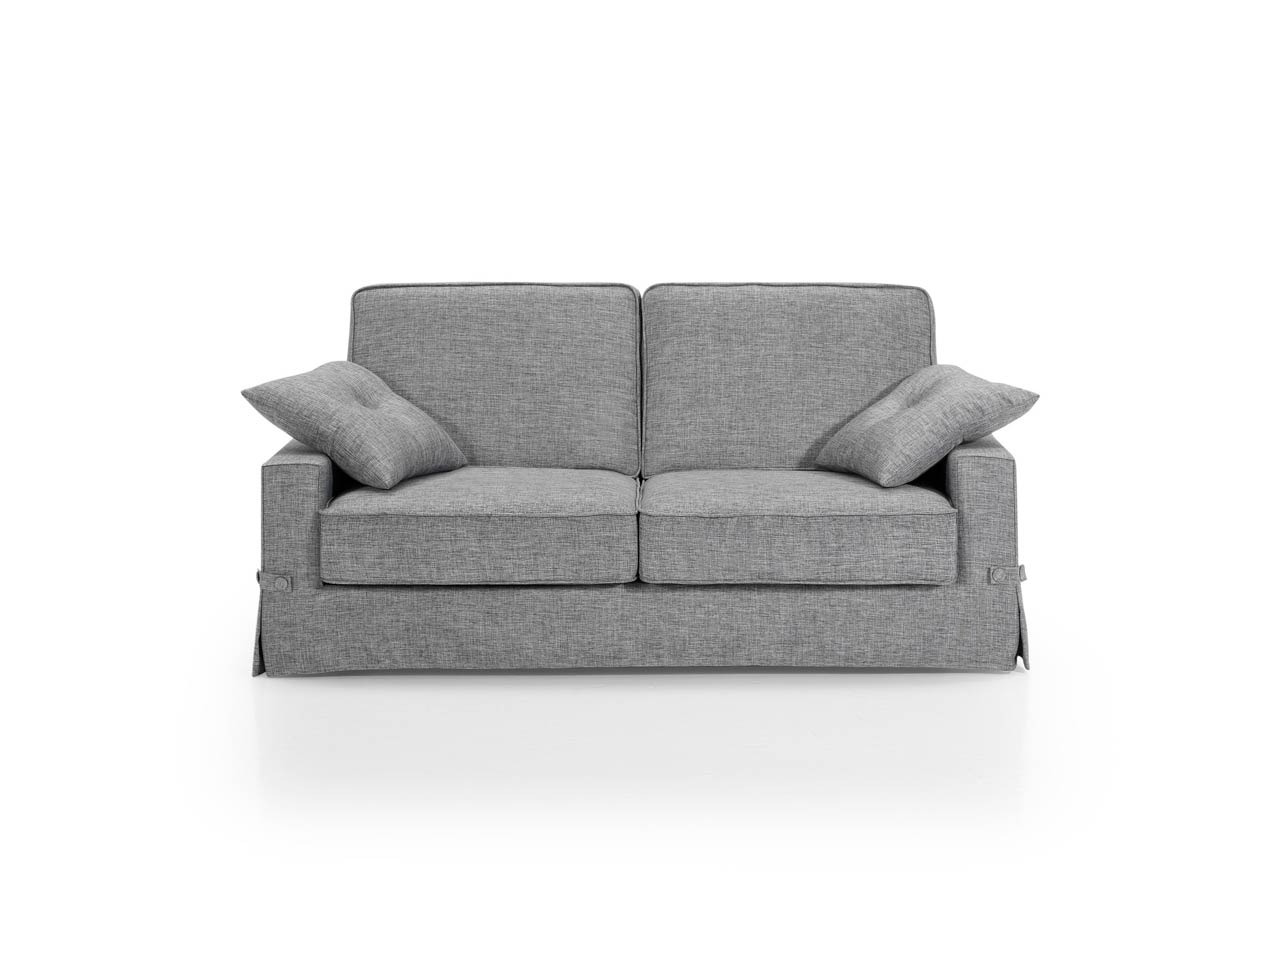 comprar sofa cama online doble cara. Black Bedroom Furniture Sets. Home Design Ideas